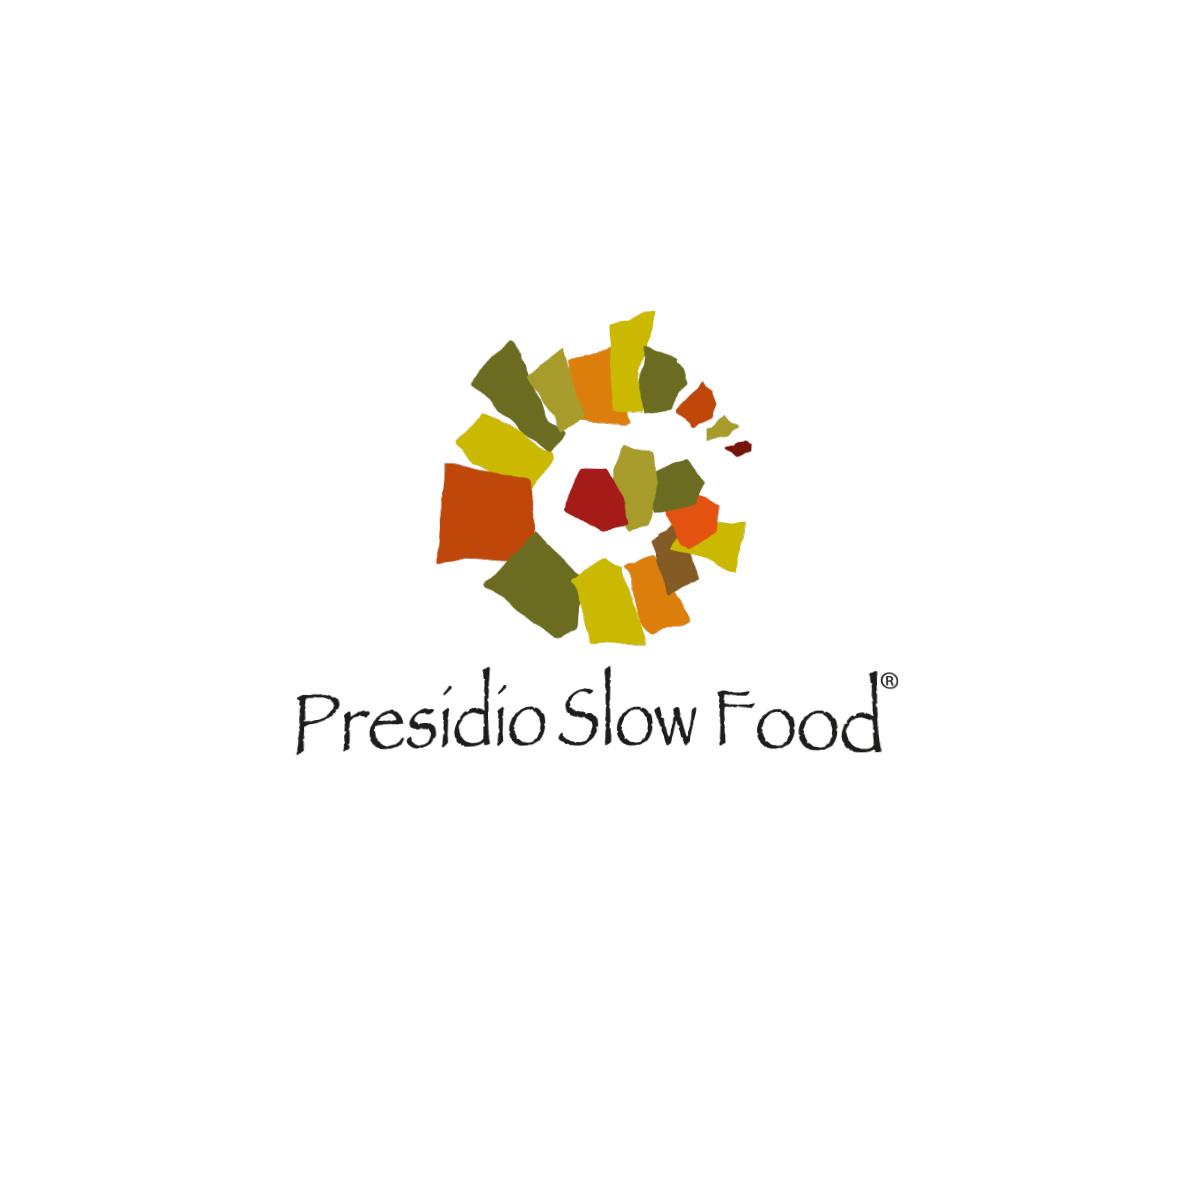 ogimage-presidioslowfood-1200x1200